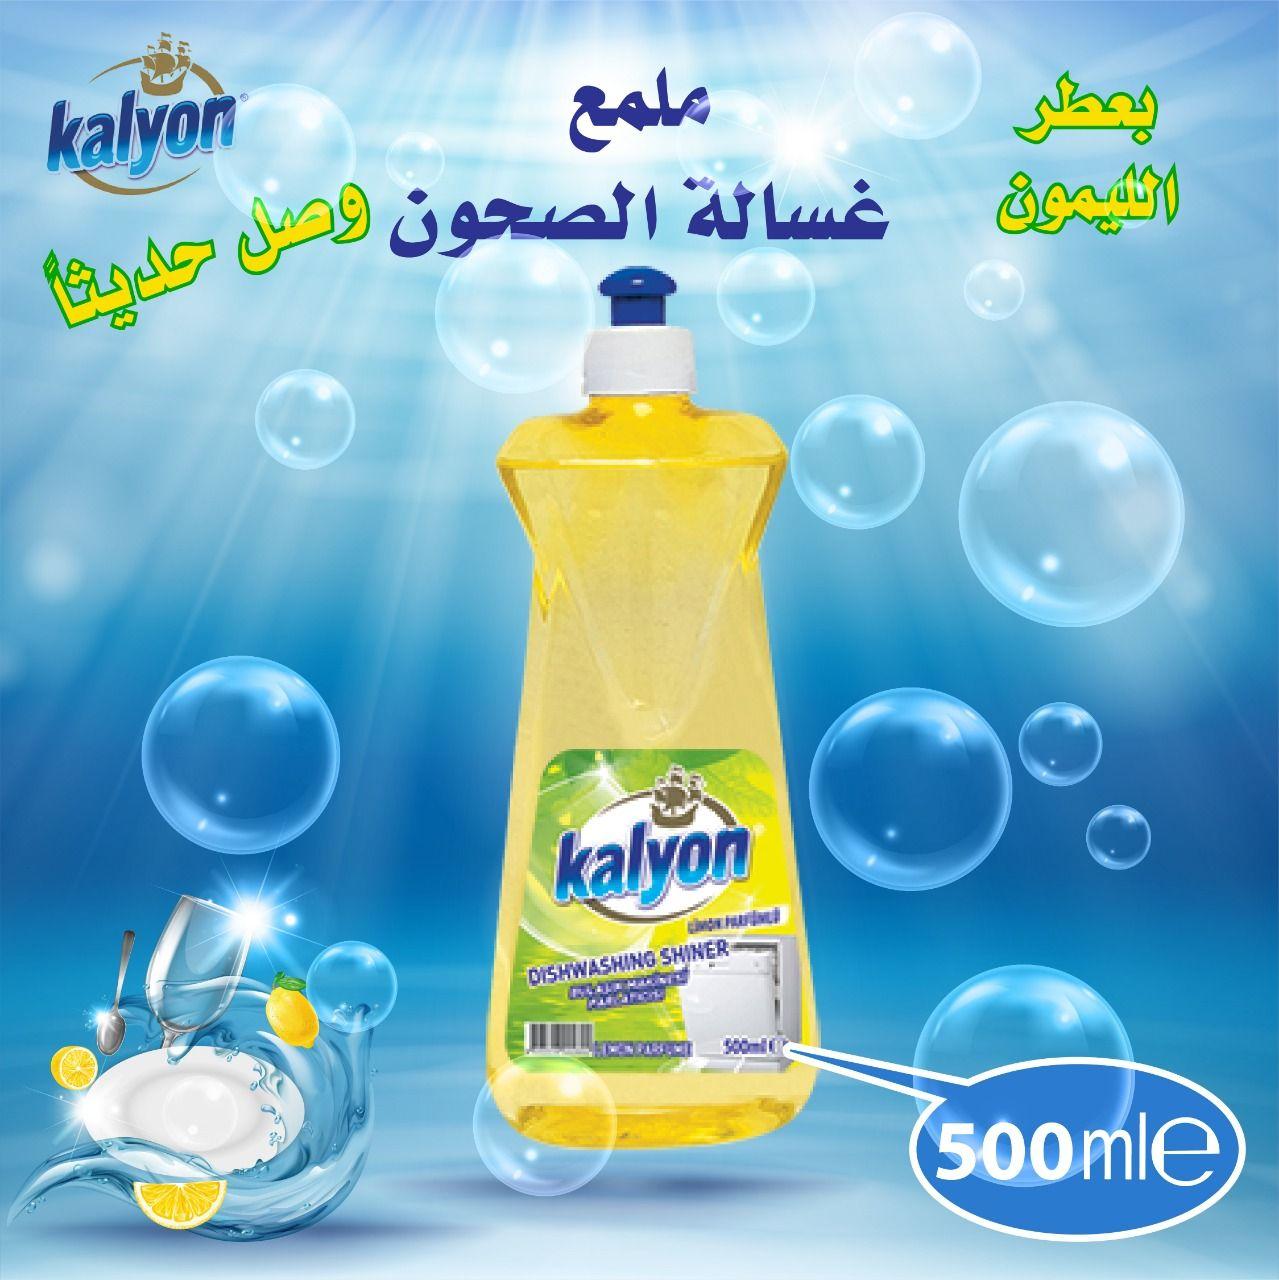 ملمع غسالة الصحون بالليمون ادوات نظافه تنظيف نظافة تمه Dish Soap Bottle Soap Bottle Cleaning Supplies